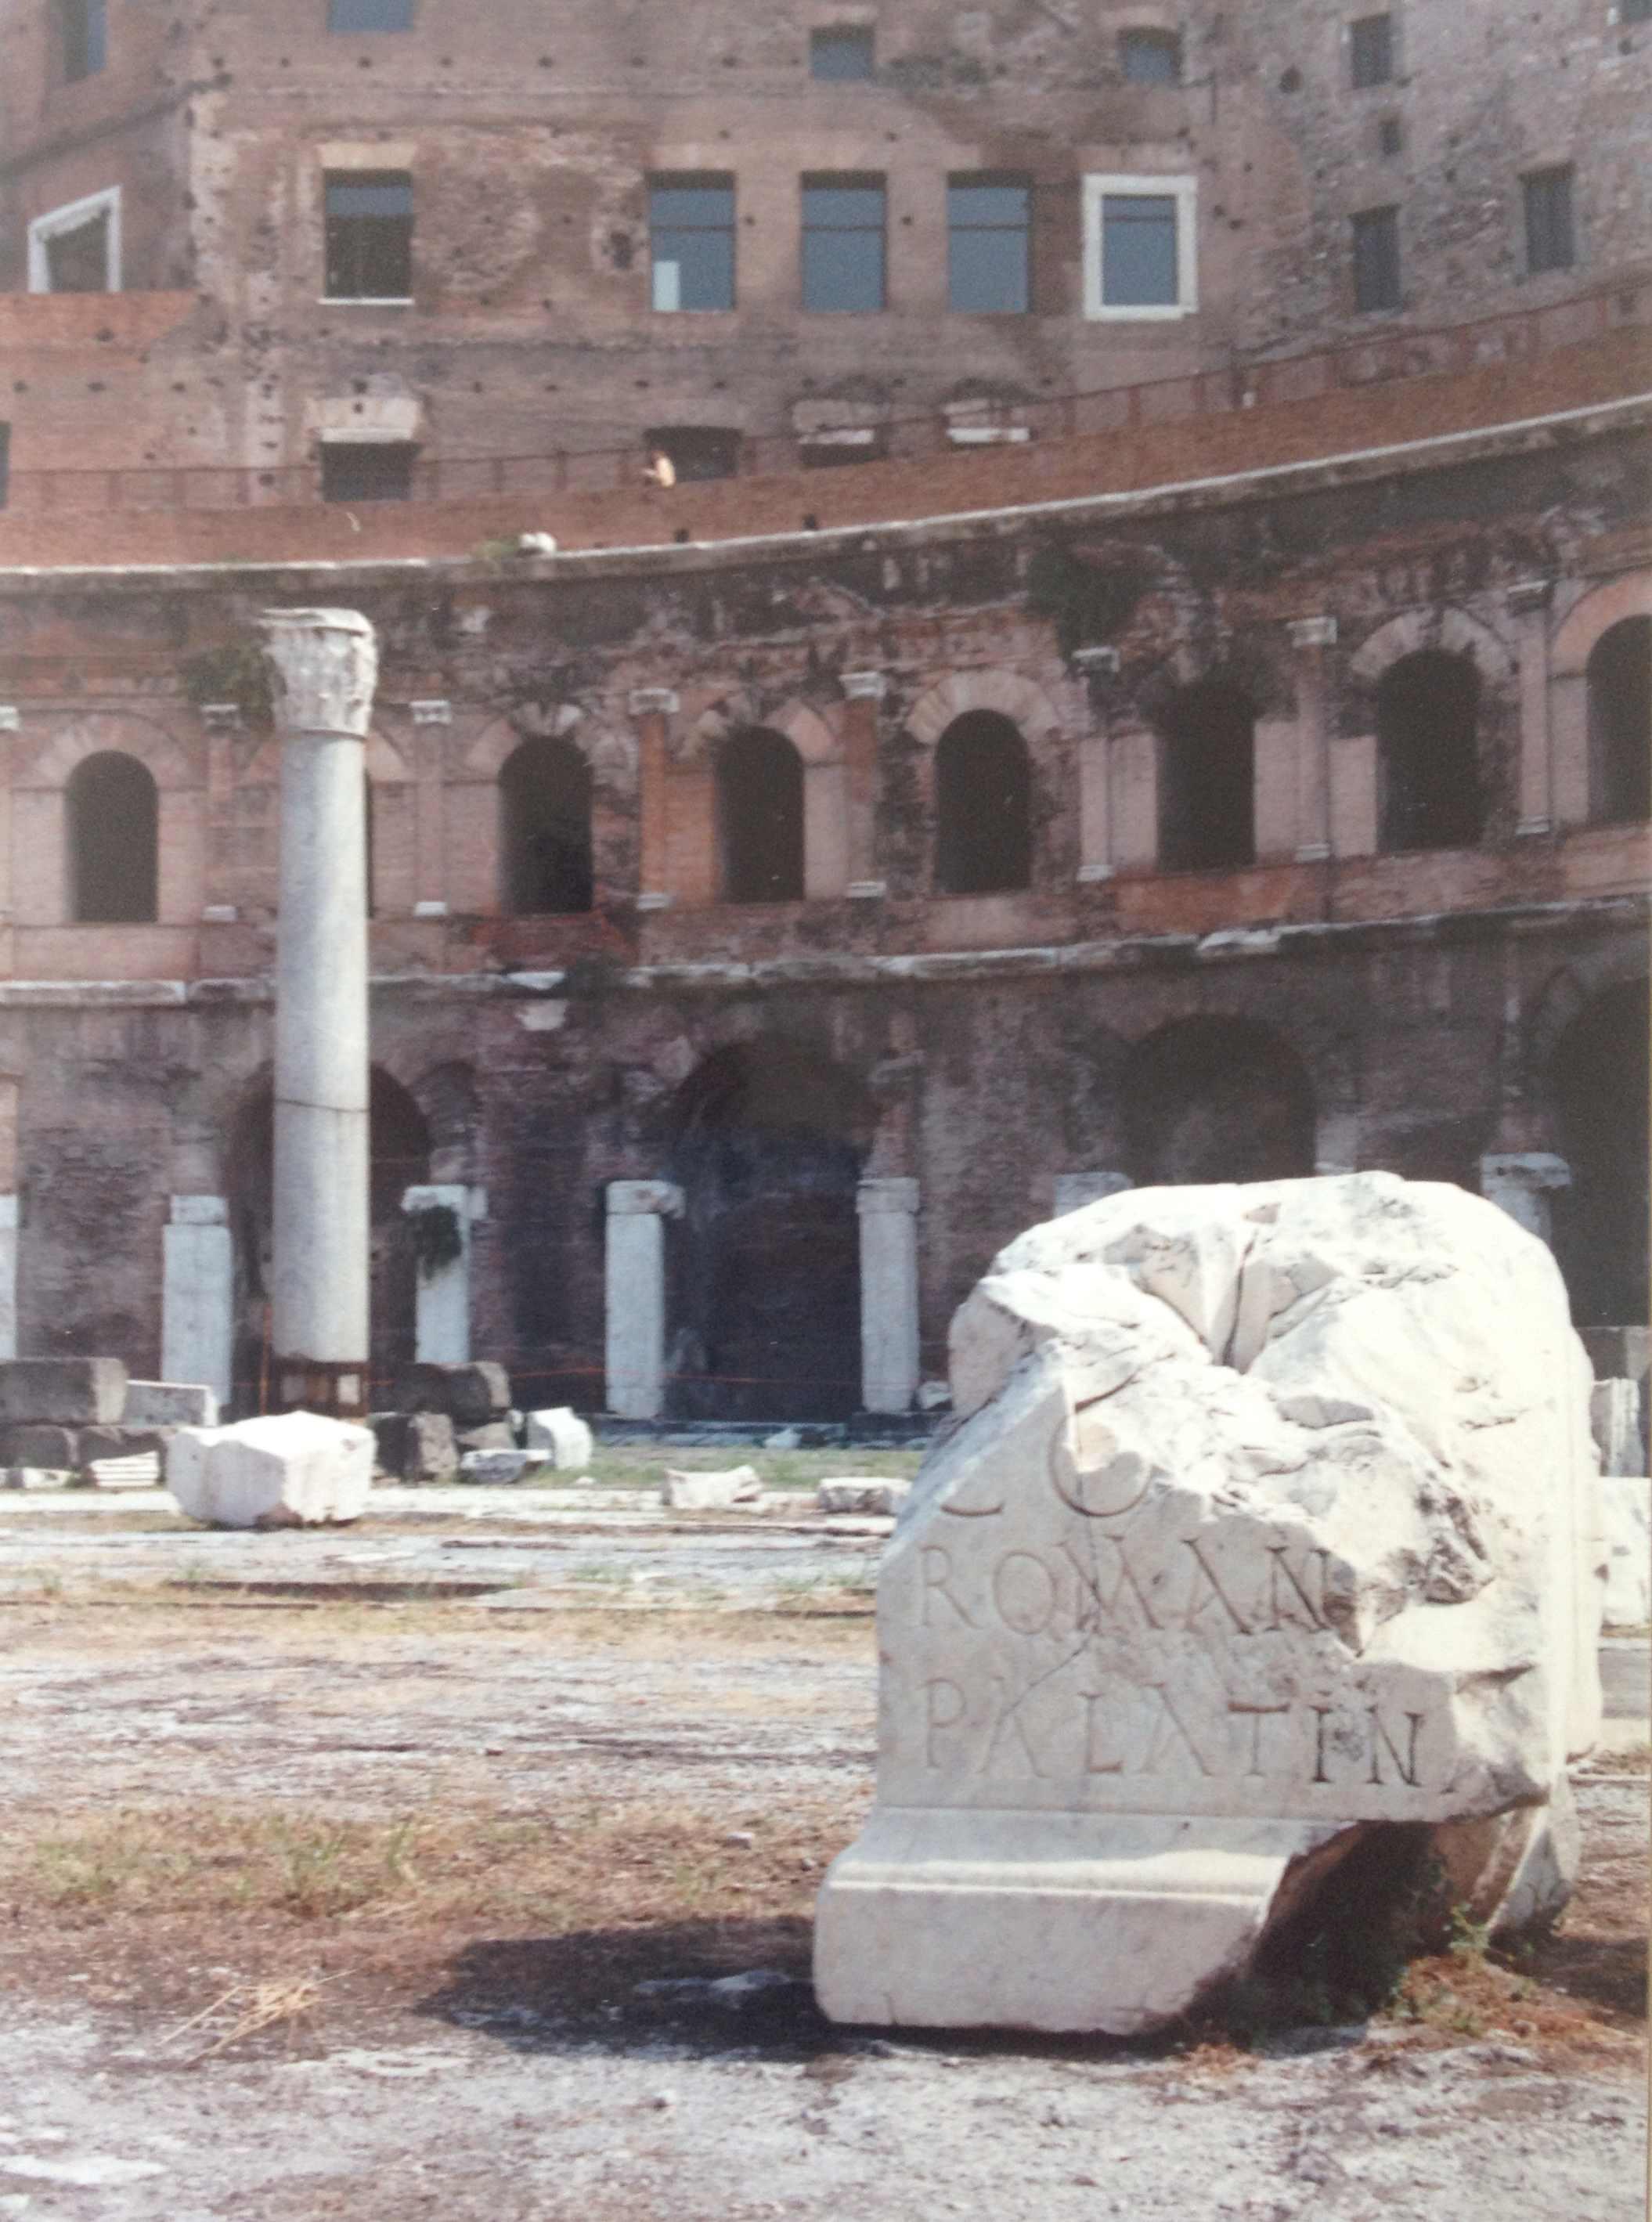 Rome-palatine-1989.jpg